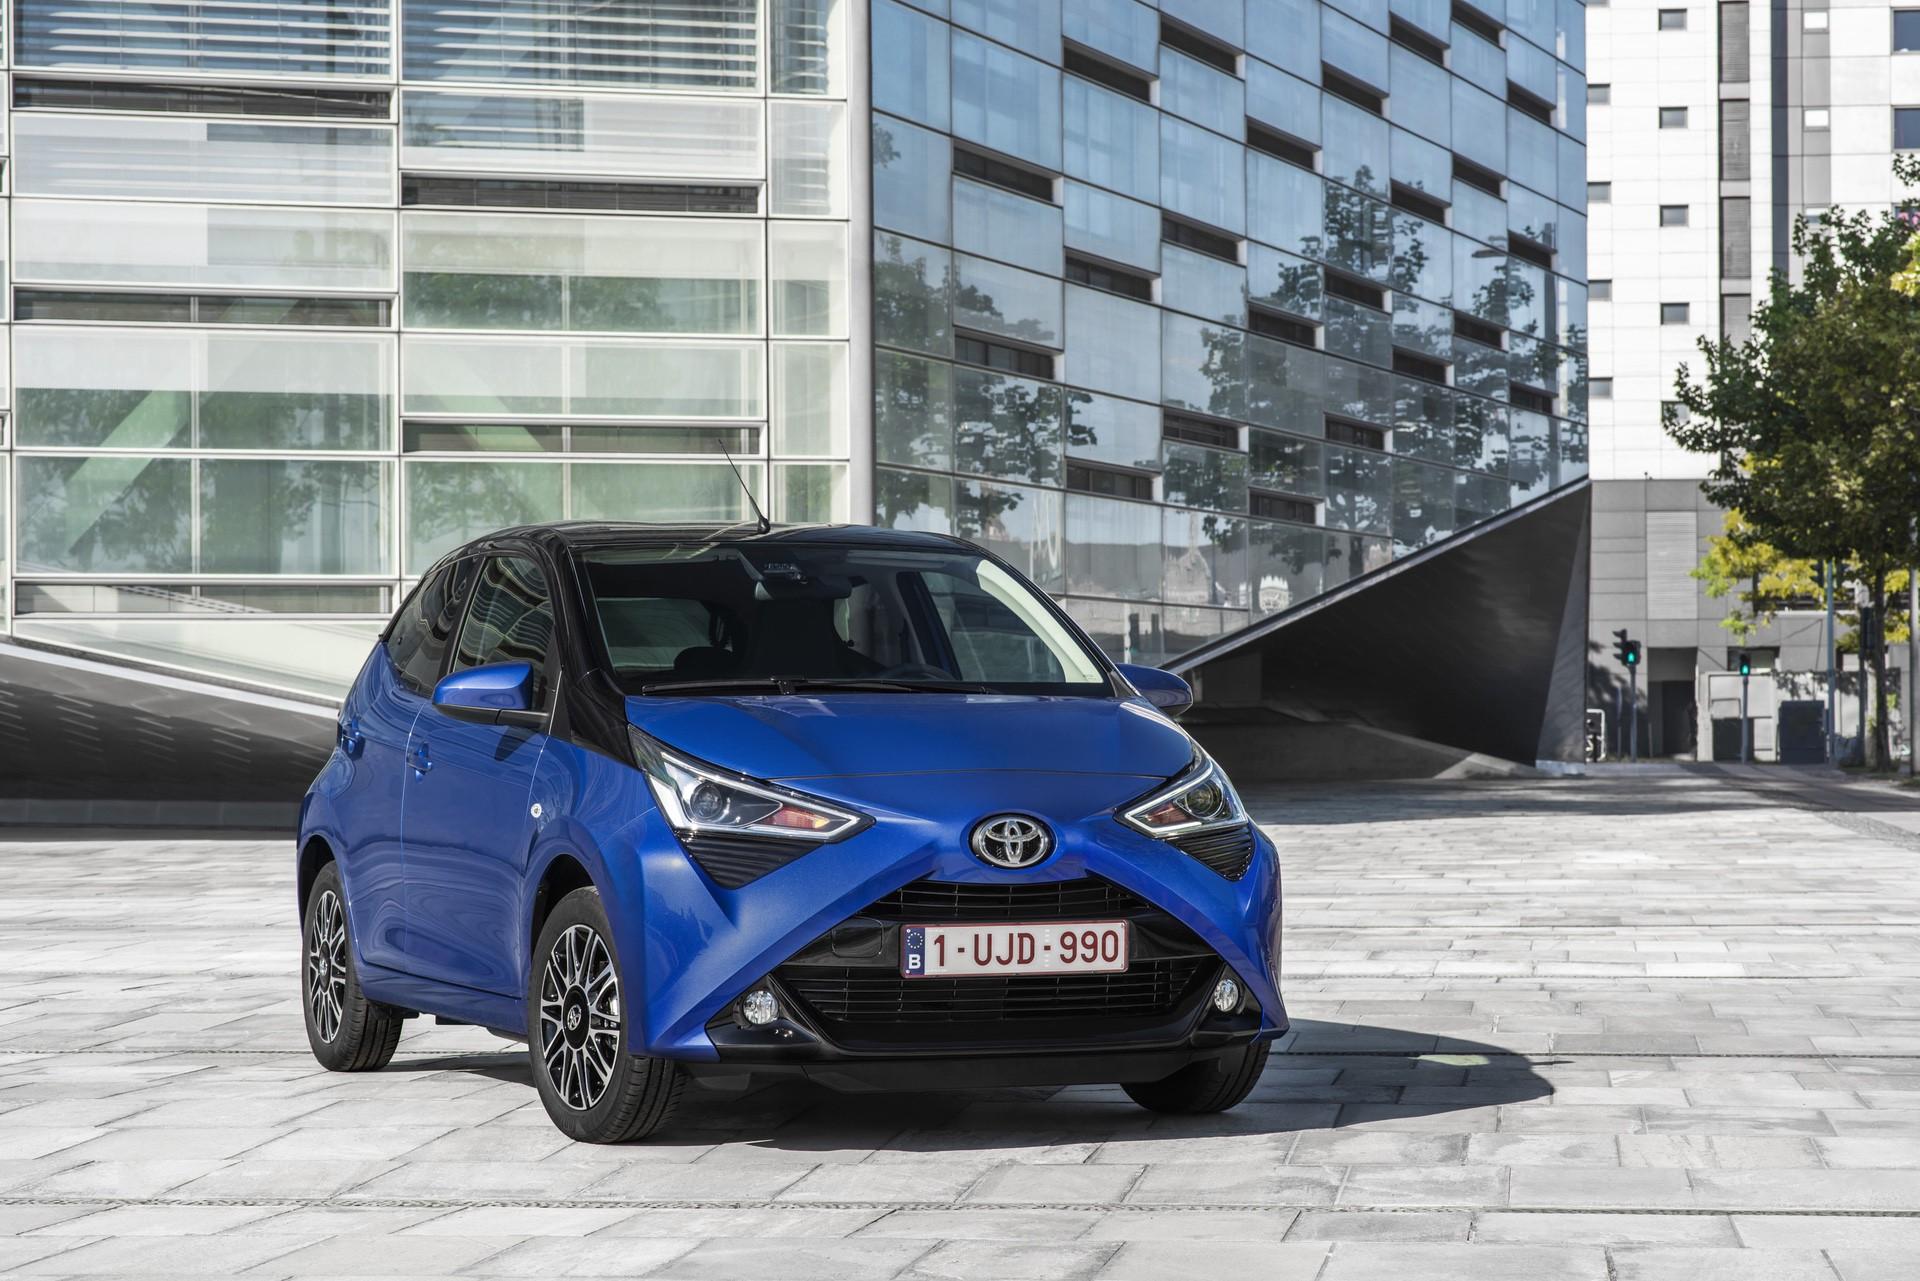 Toyota_Aygo_facelift_presskit_0027